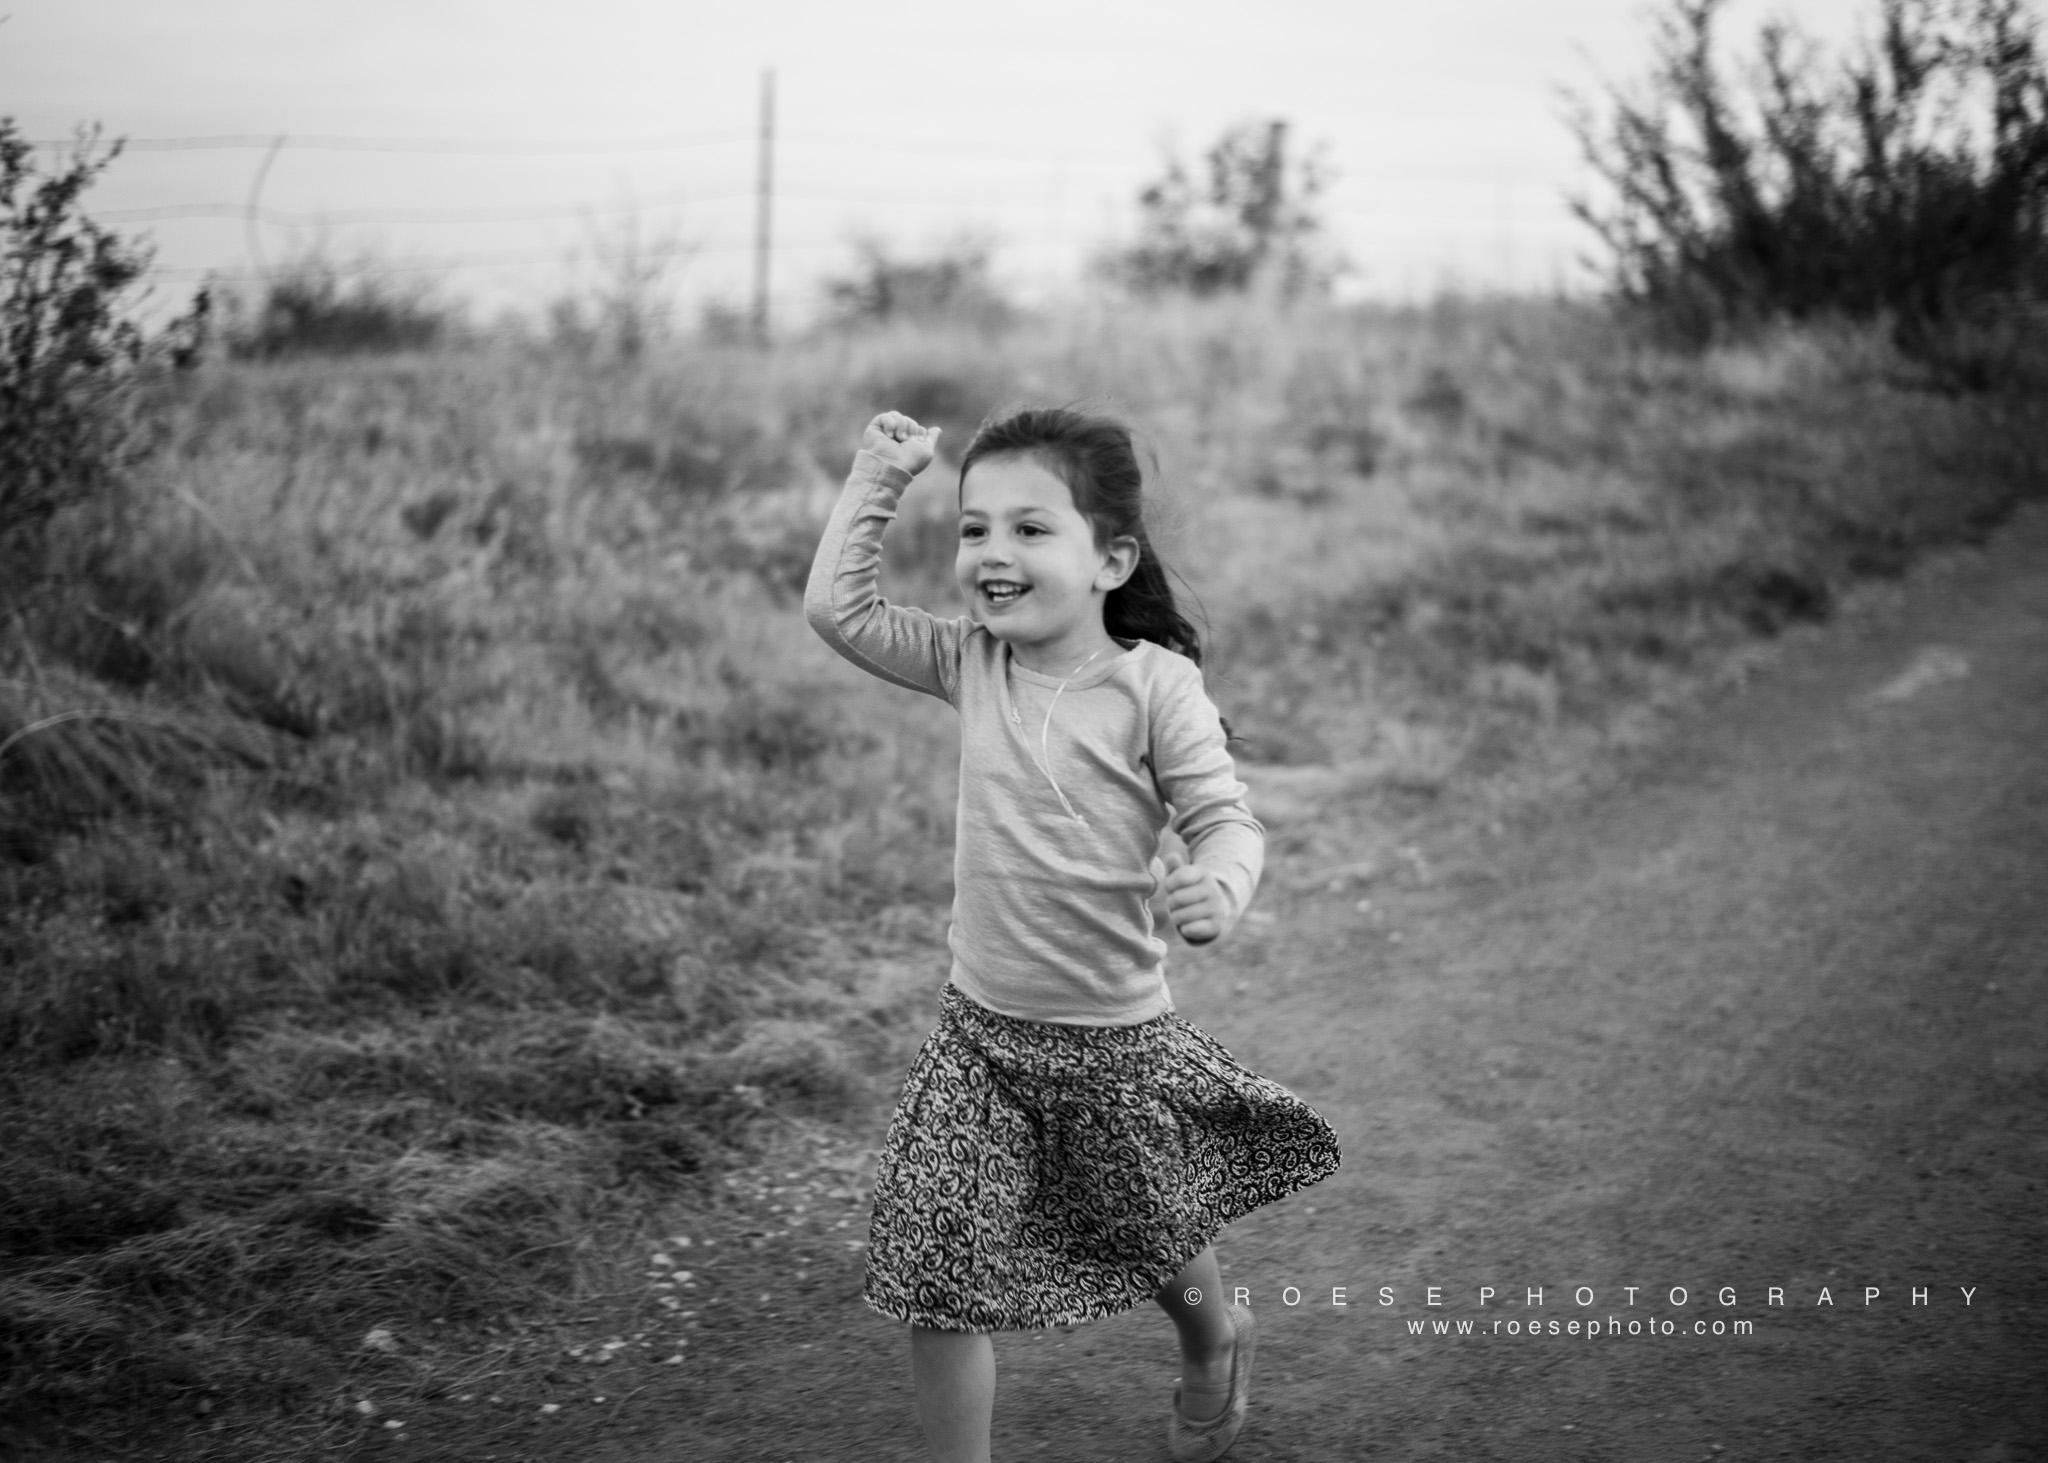 C.-Roese-Ramp-Roese-Photography-LLC.-Bennett-Family-26.jpg